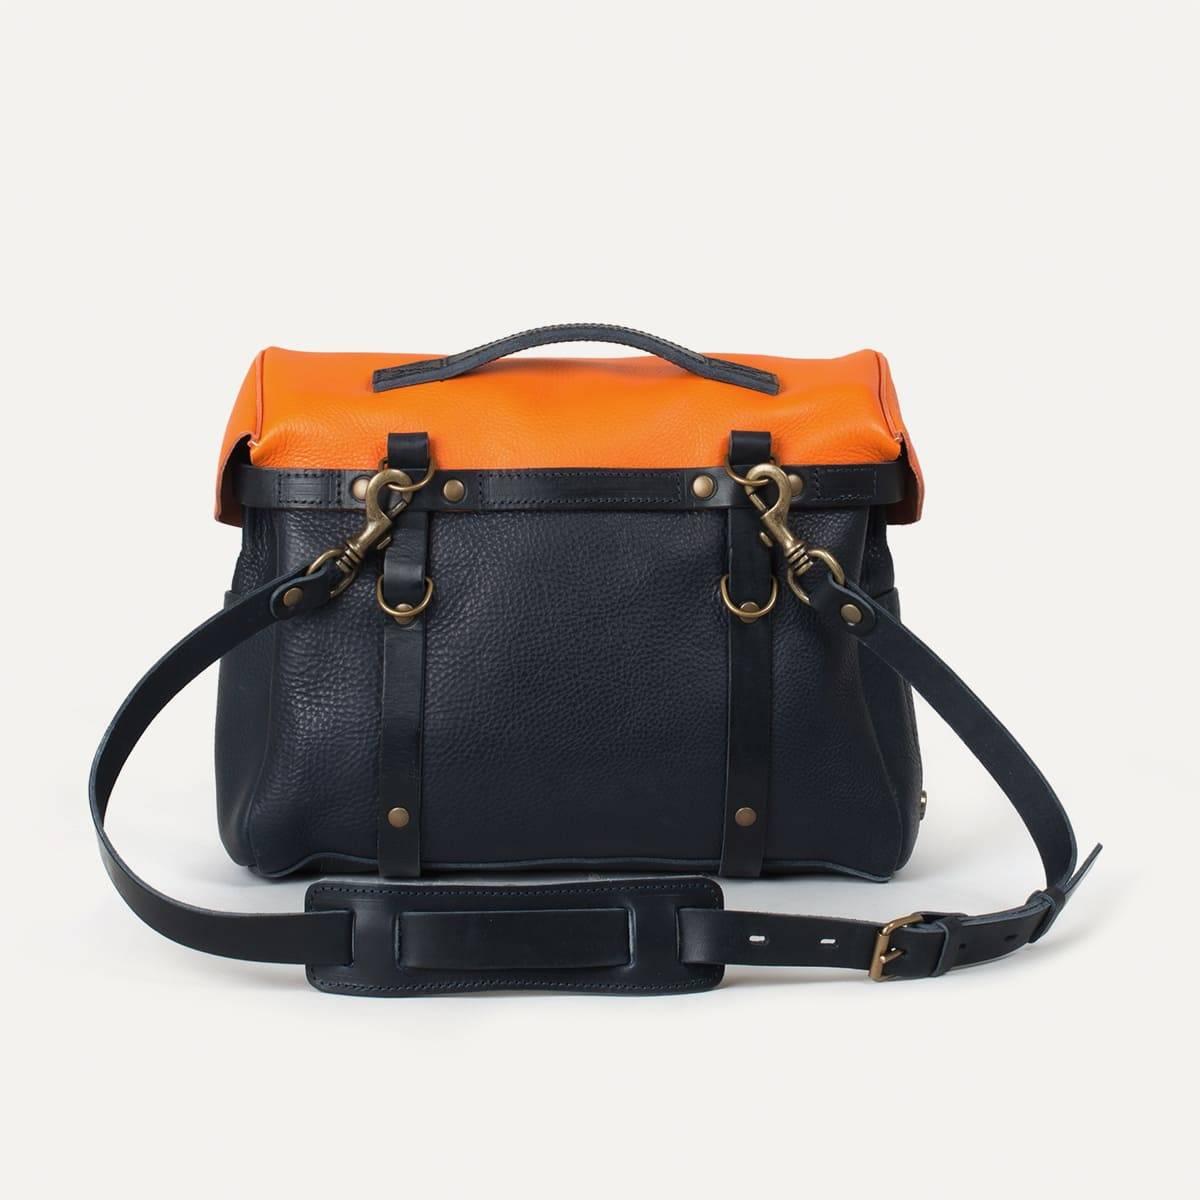 Bleu de Chauffe x Blitz Eclair bag - Navy/Orange (image n°5)